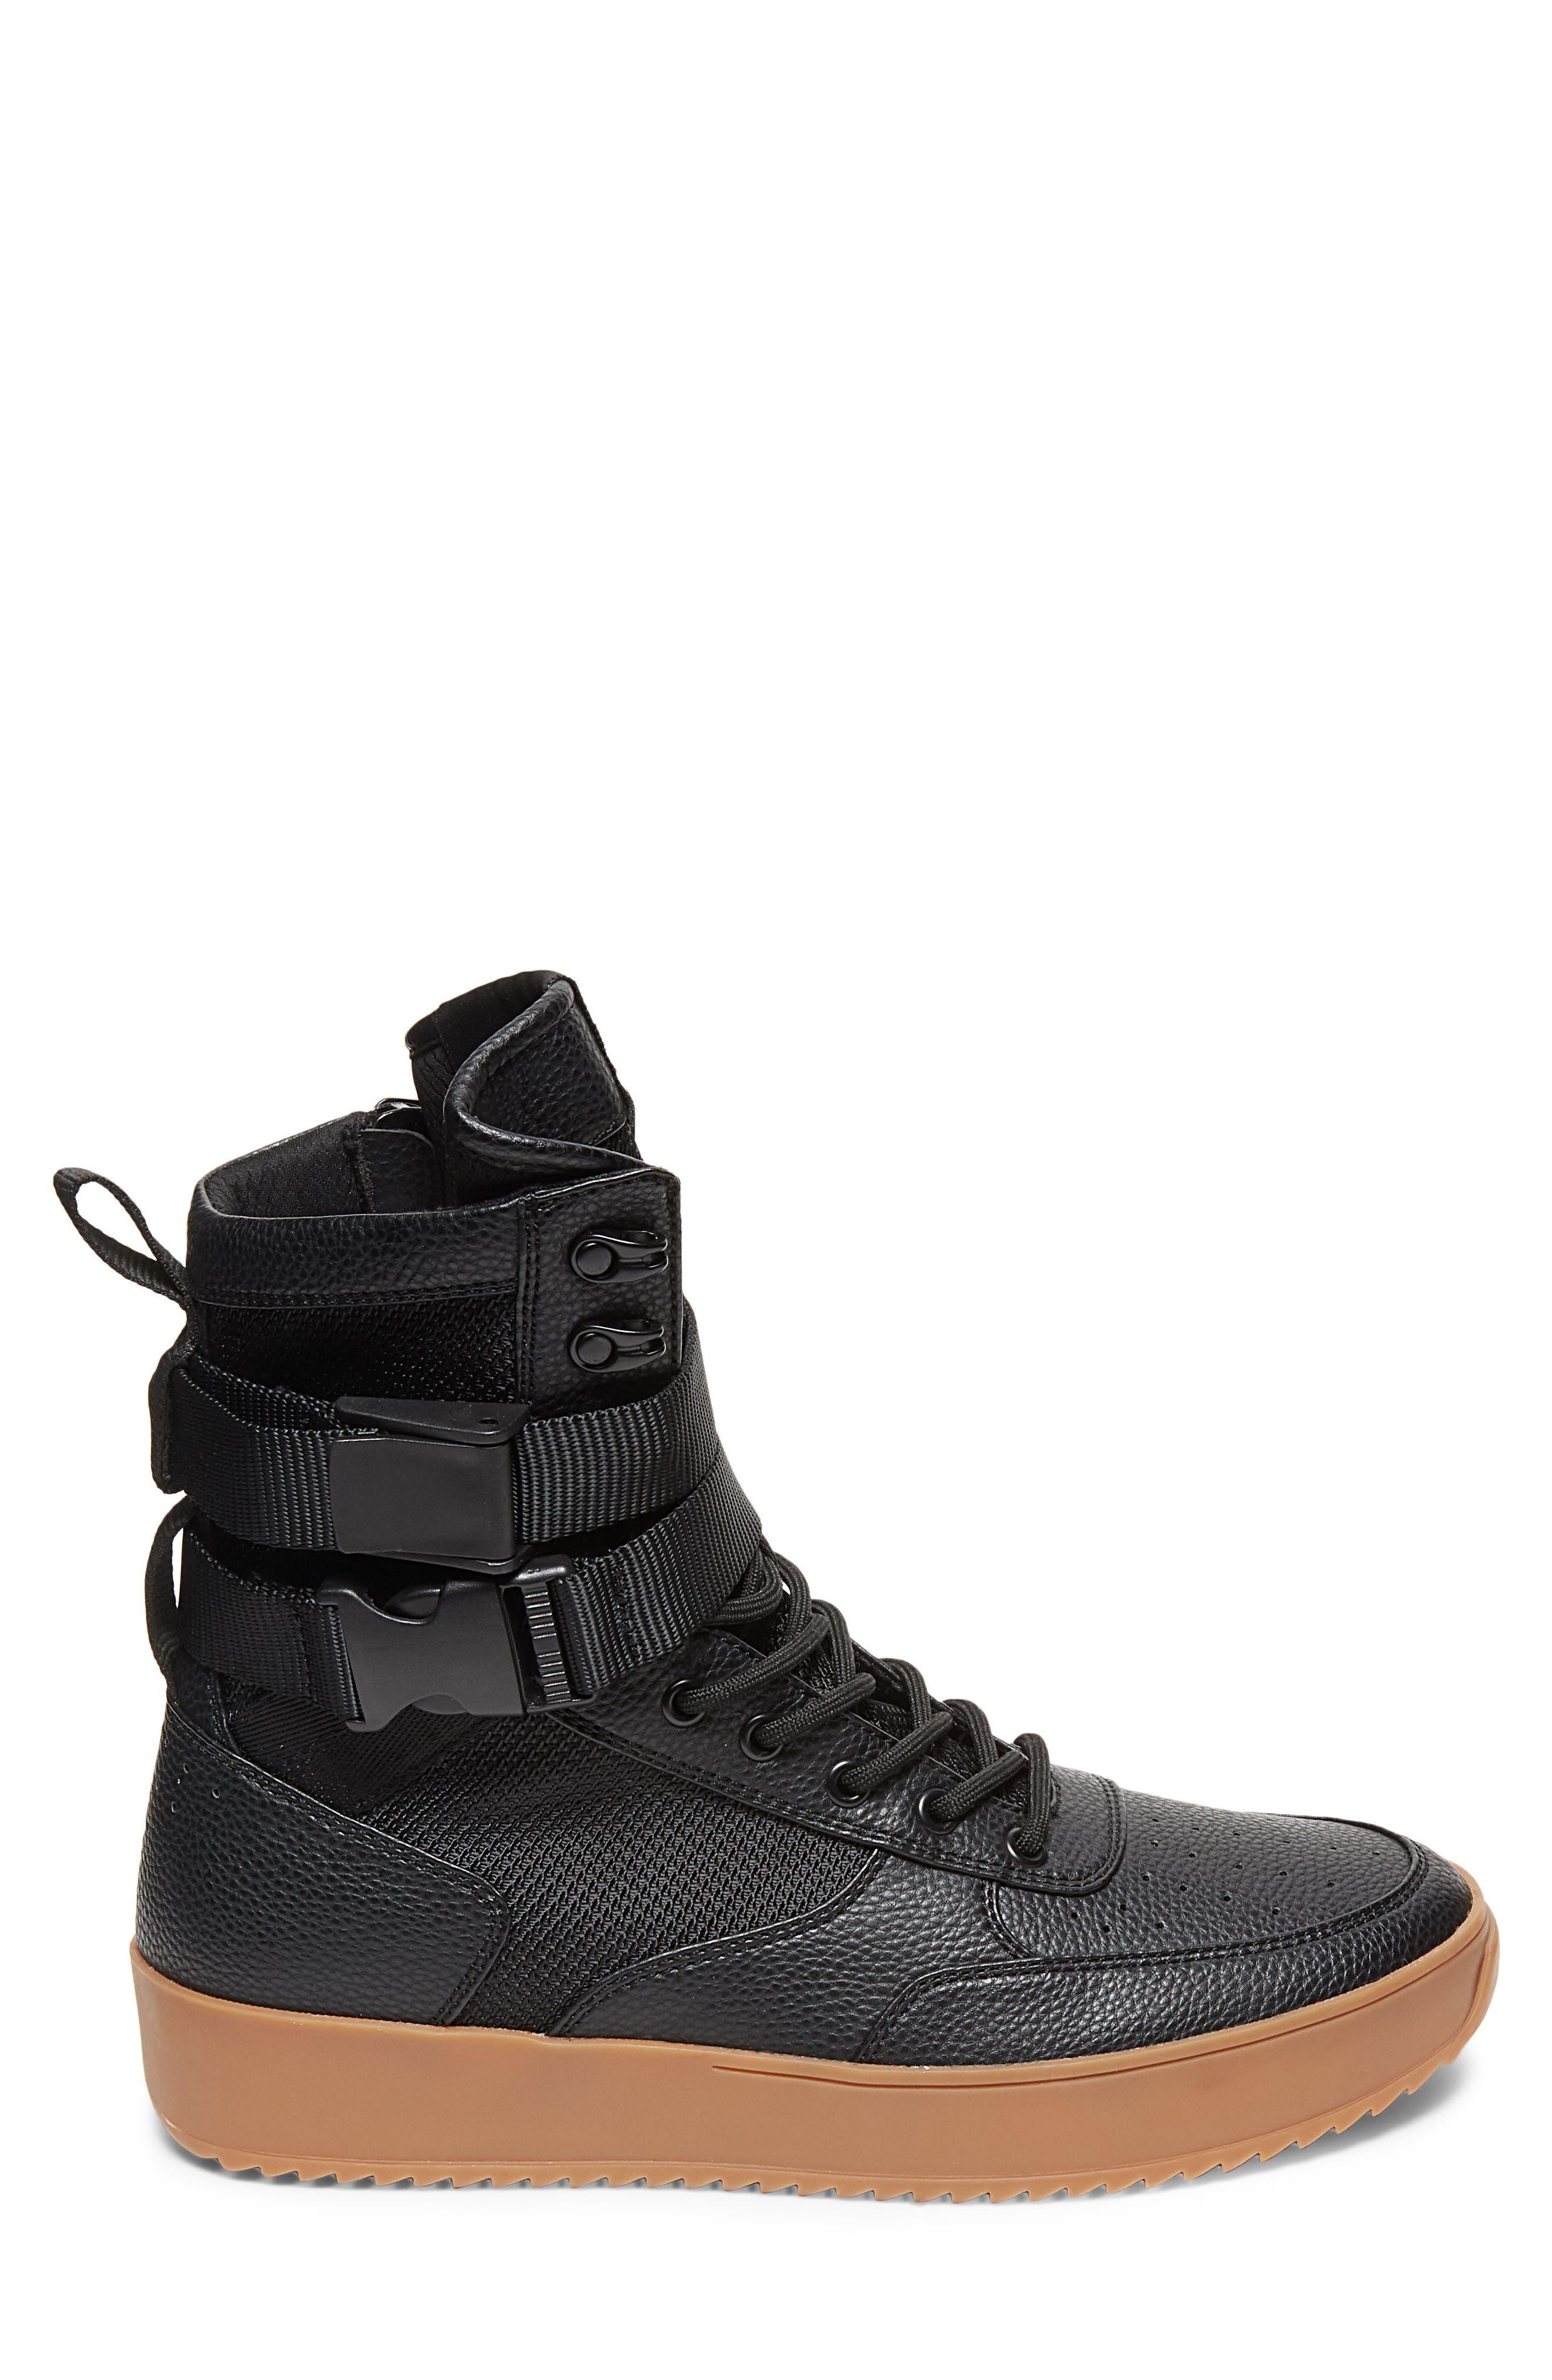 Zeroday Sneaker,                             Alternate thumbnail 3, color,                             Black